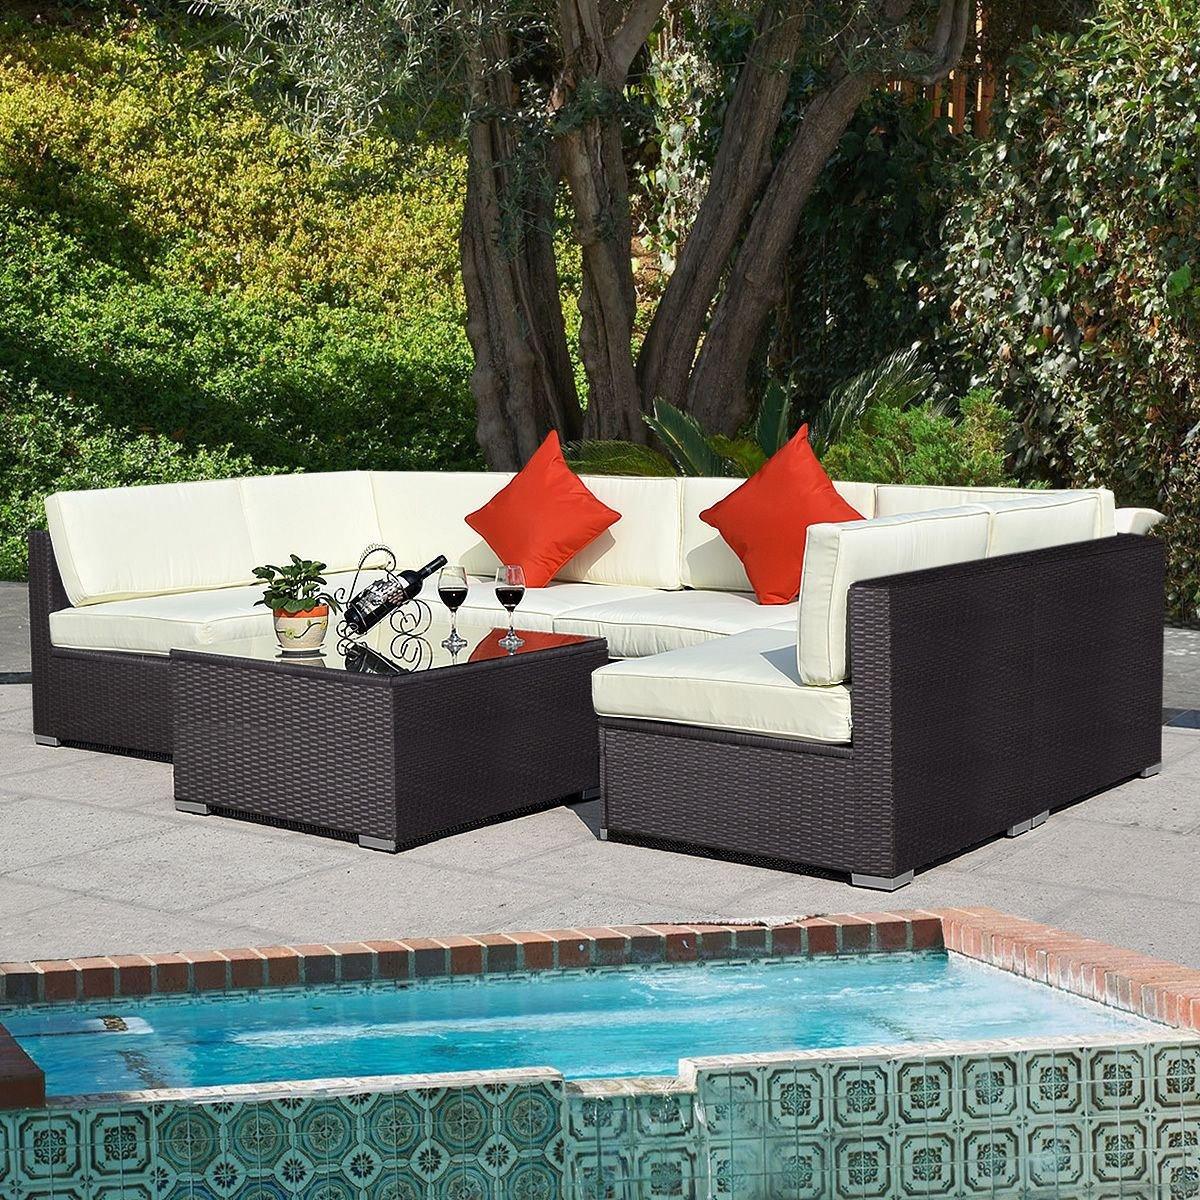 Amazon com   Giantex Outdoor Patio 7PC Furniture Sectional PE Wicker Rattan  Sofa Set Deck Couch Brown   Patio  Lawn   GardenAmazon com   Giantex Outdoor Patio 7PC Furniture Sectional PE  . Rattan Garden Corner Sofa Ebay. Home Design Ideas